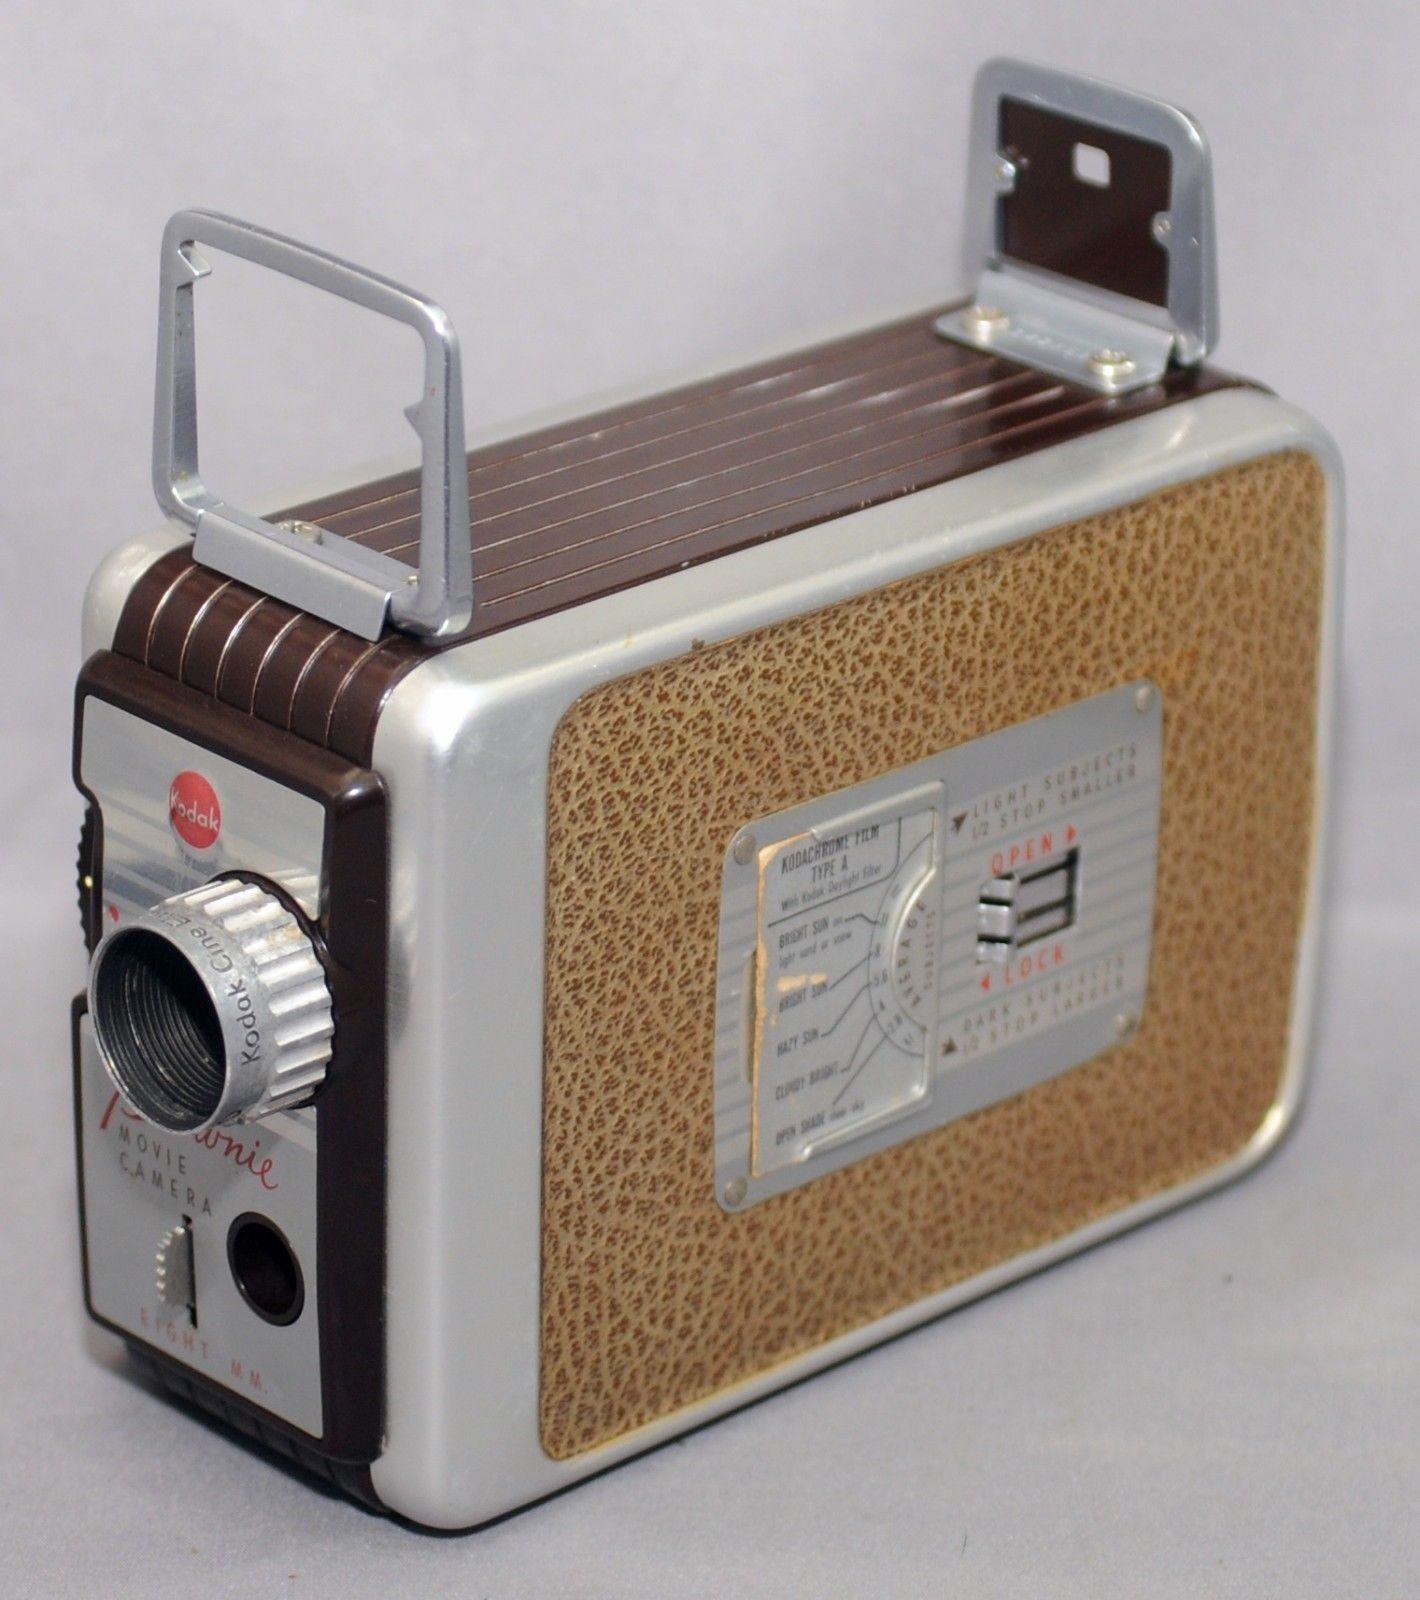 KODAK BROWNIE EIGHT MM 8mm Vintage Movie Camera Cine Ektanon f/2.7 13mm lens USA